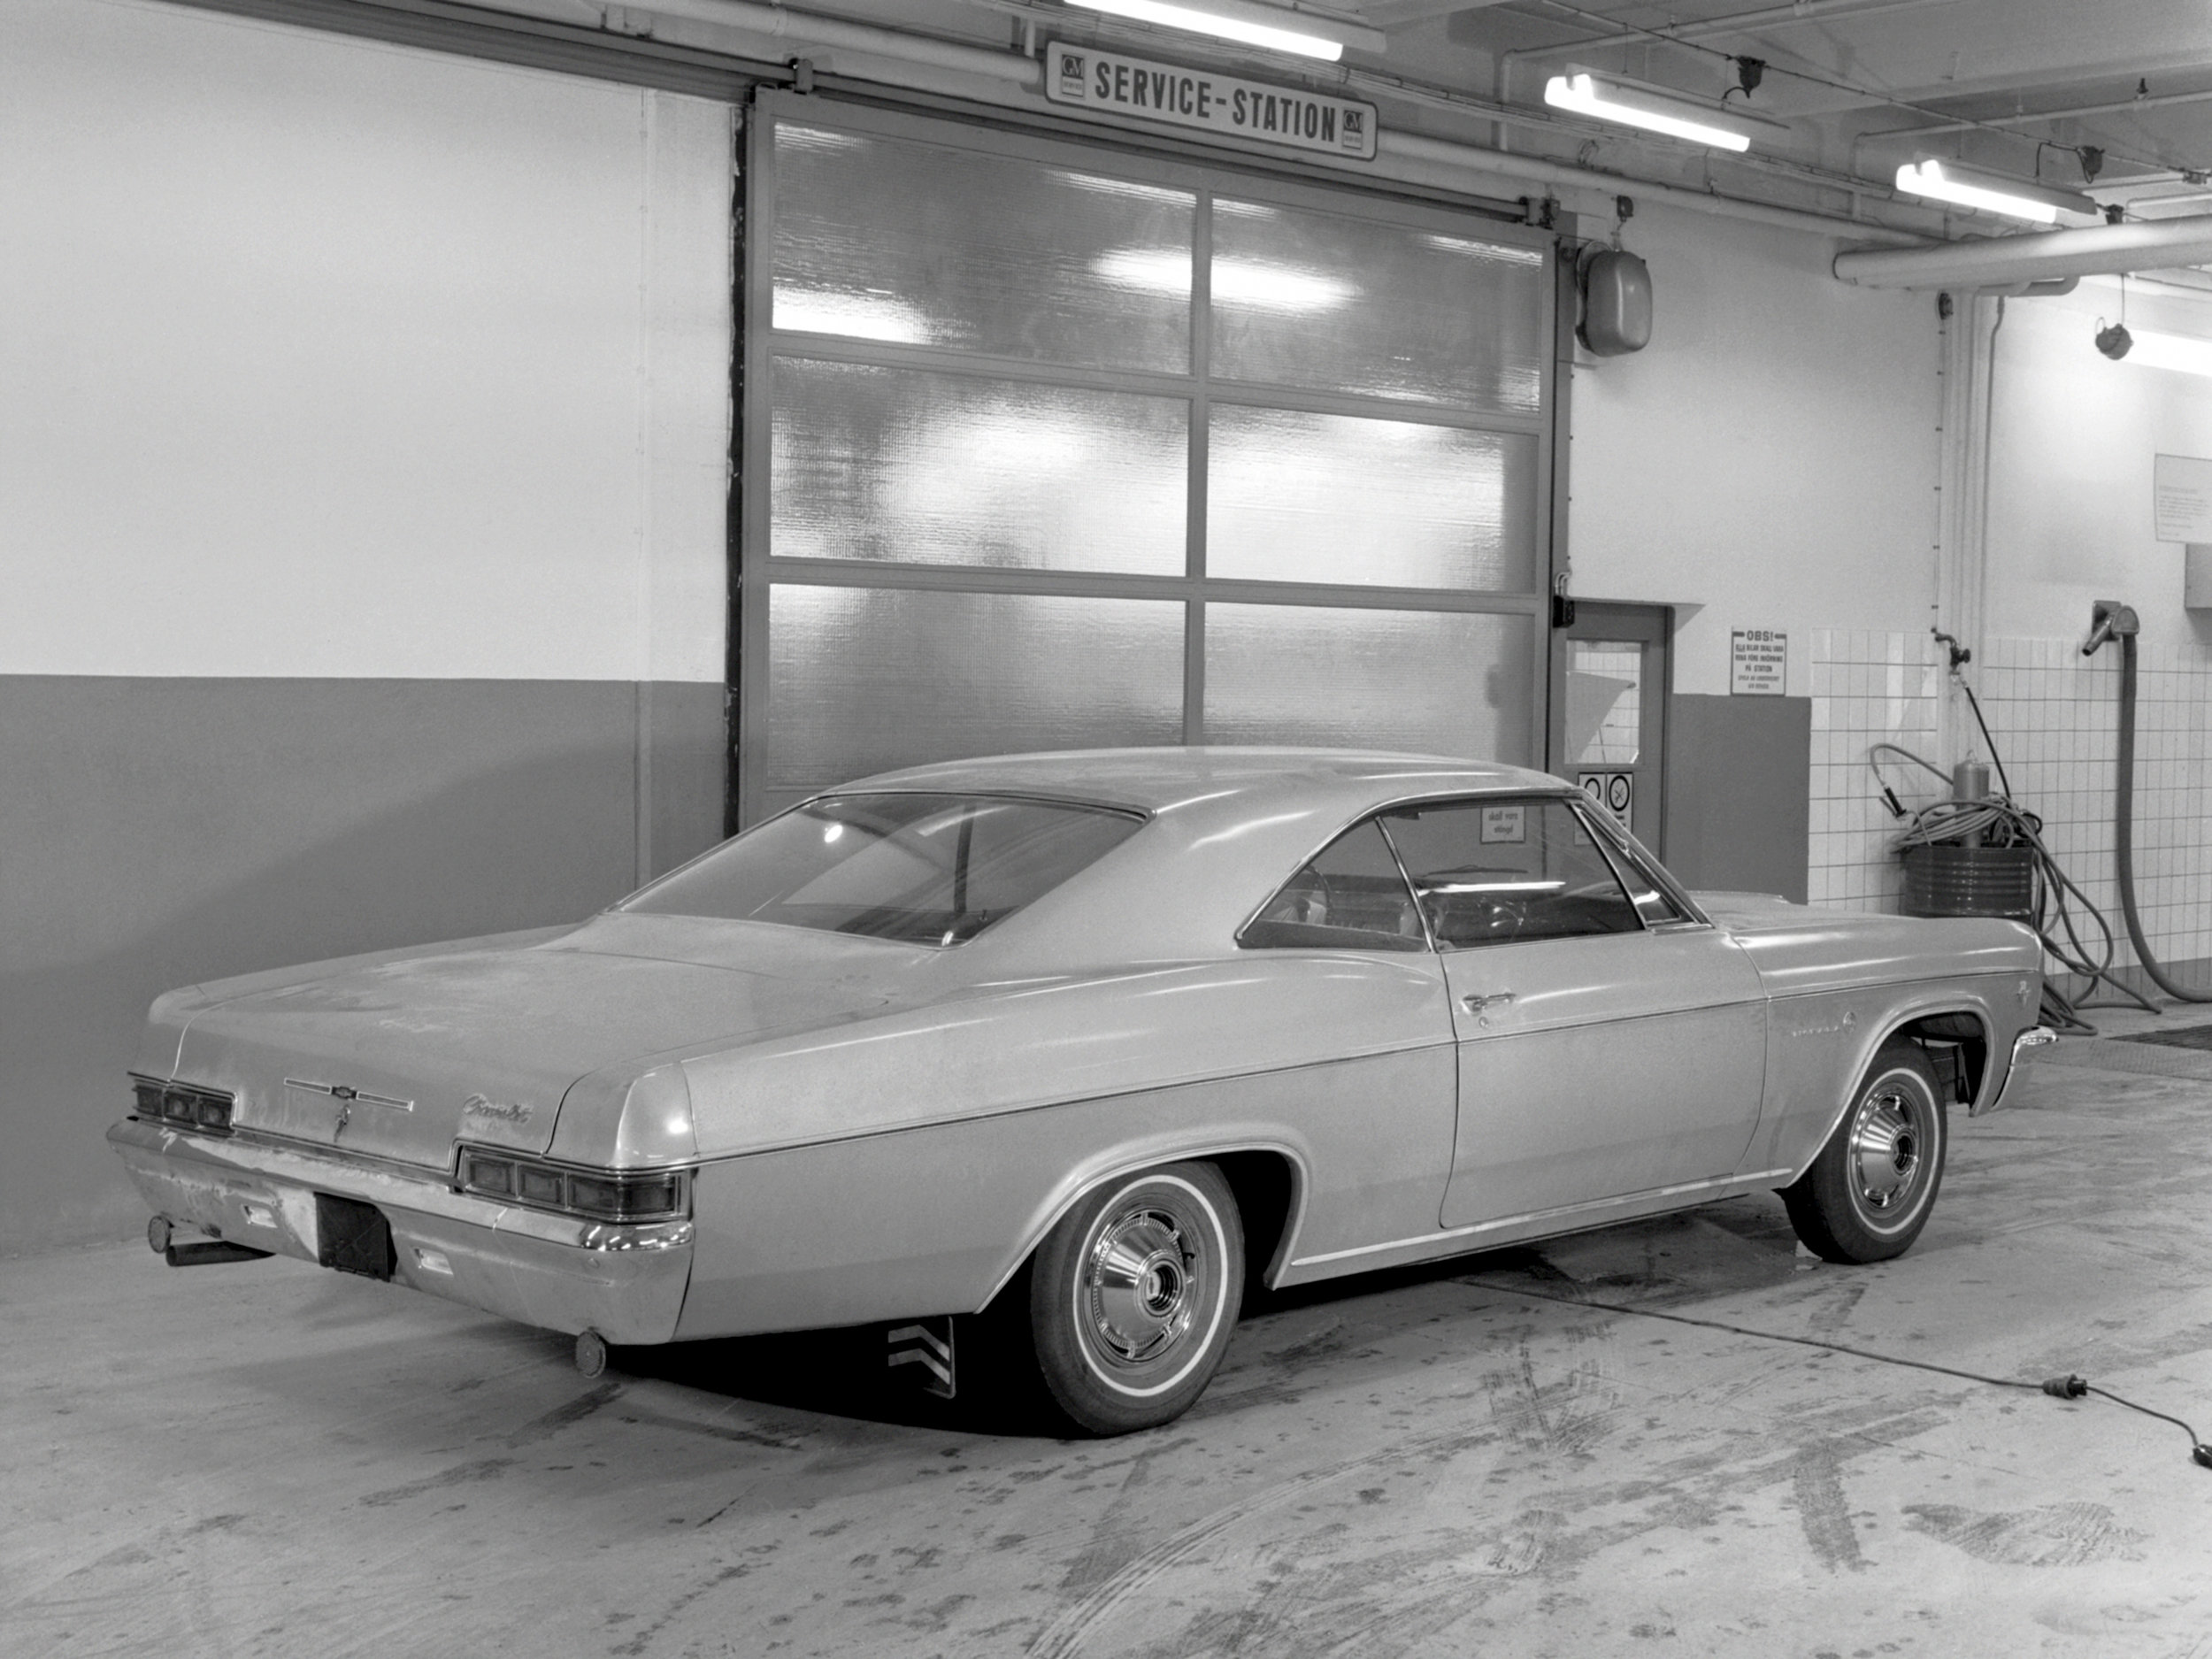 1966-chevrolet_impala-03.jpeg